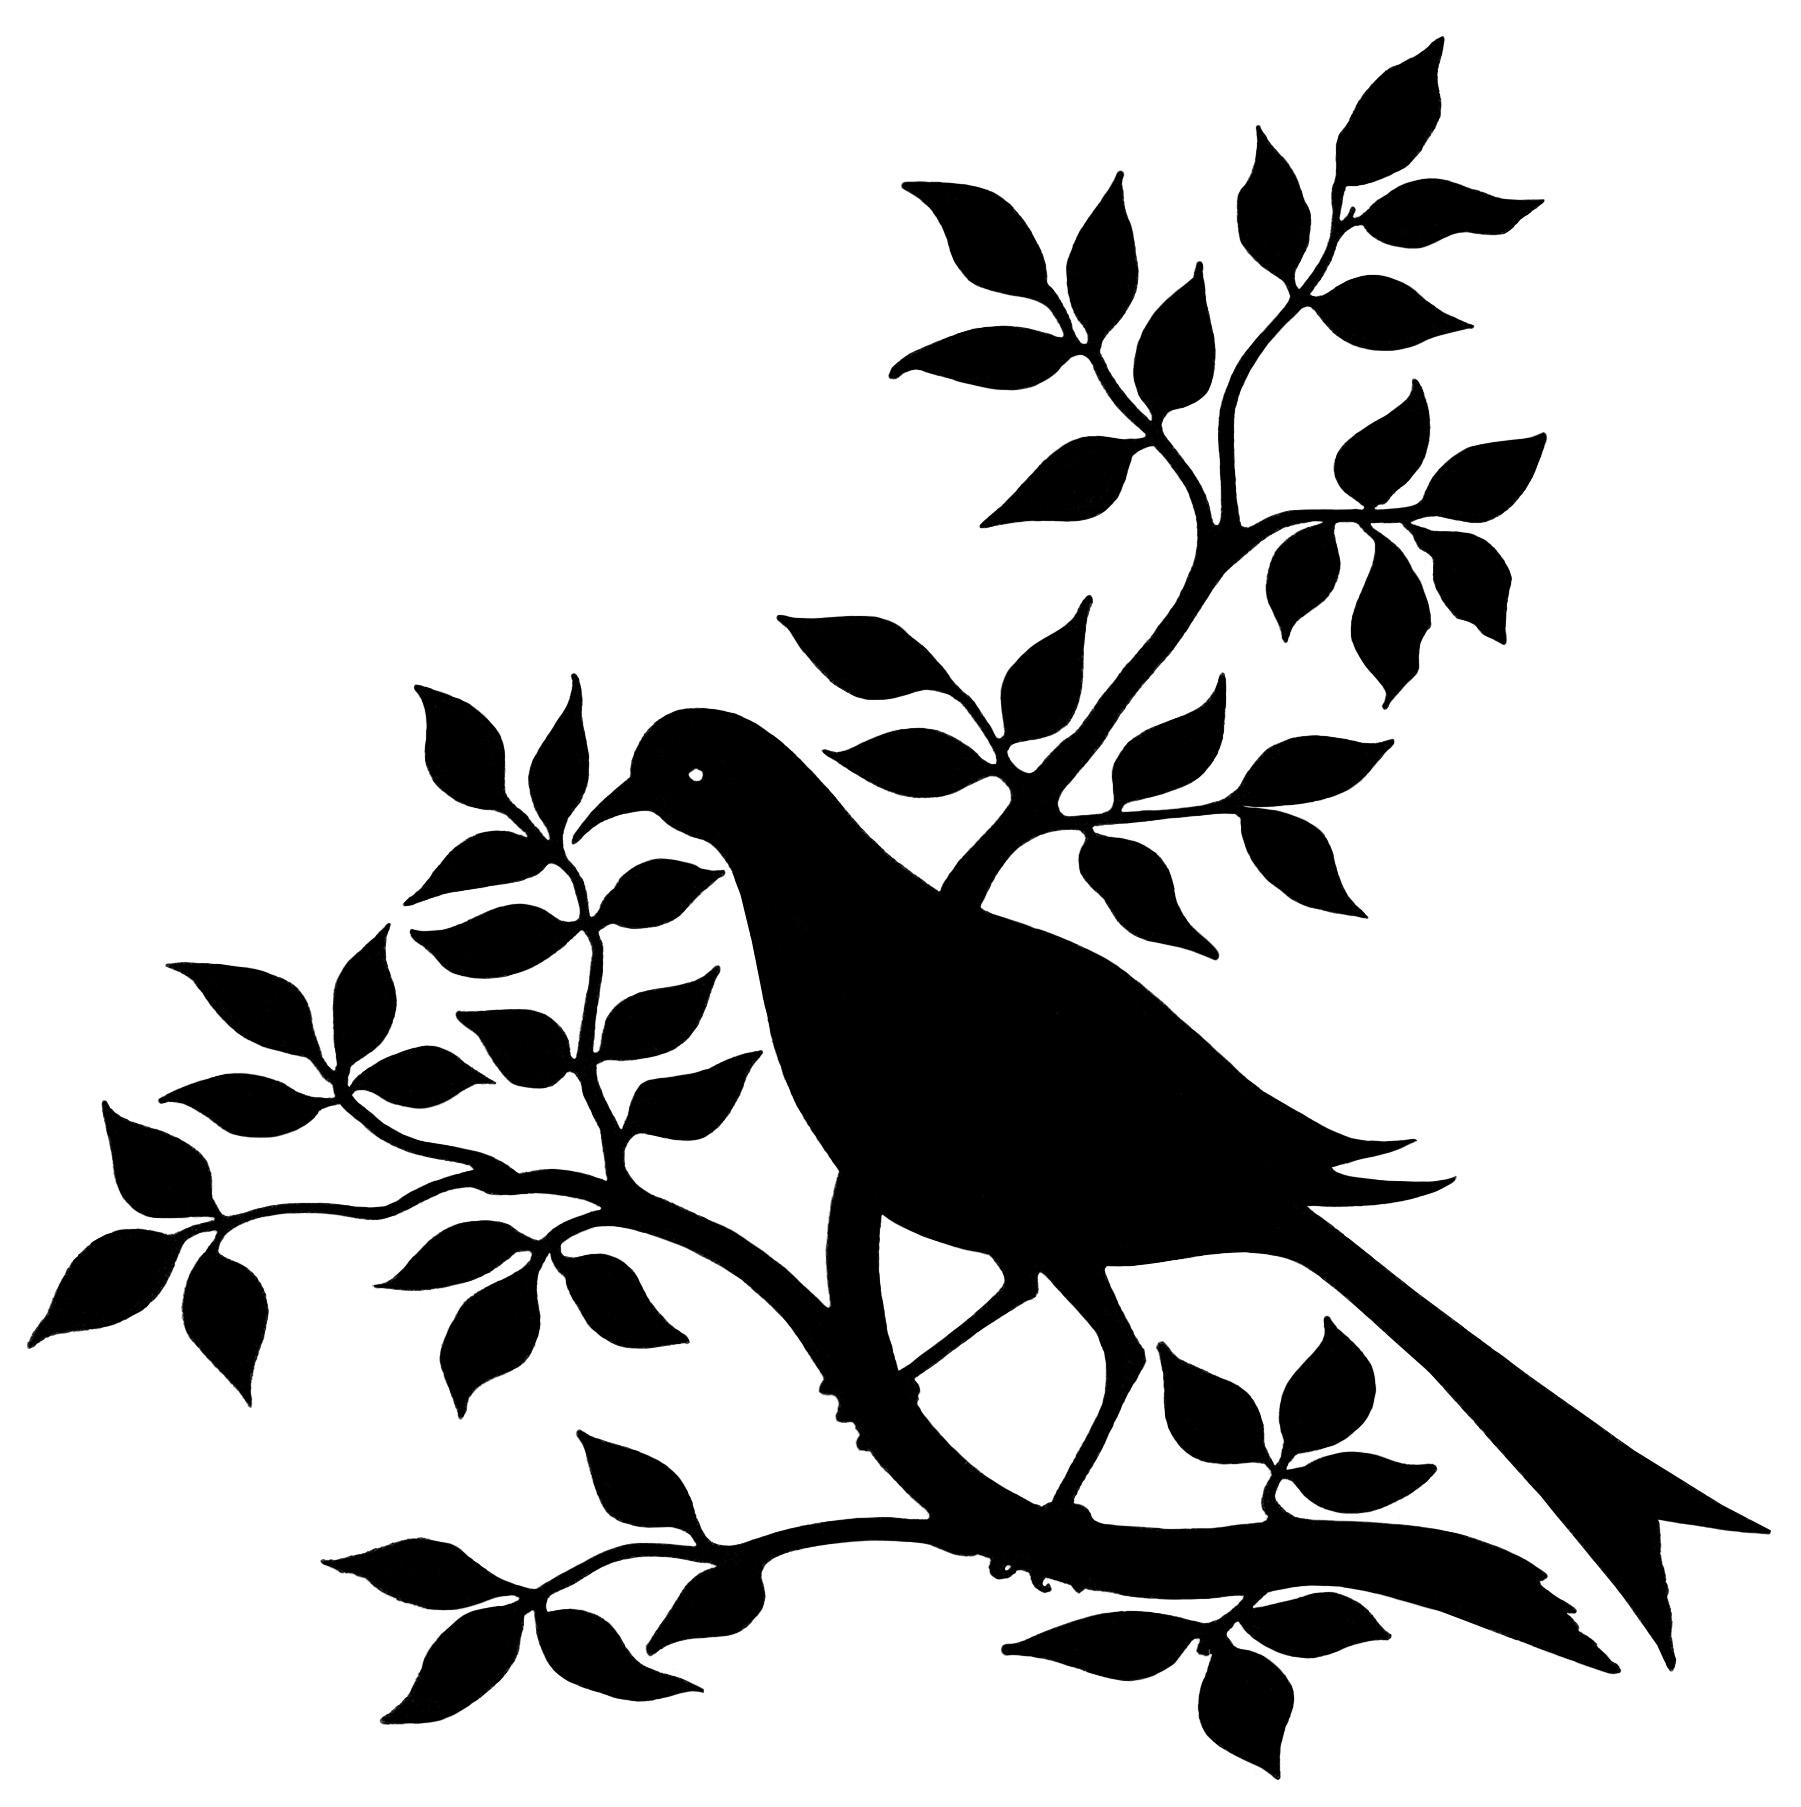 1801x1807 Bird On Branch Silhouette ~ Free Vintage Image Old Design Shop Blog